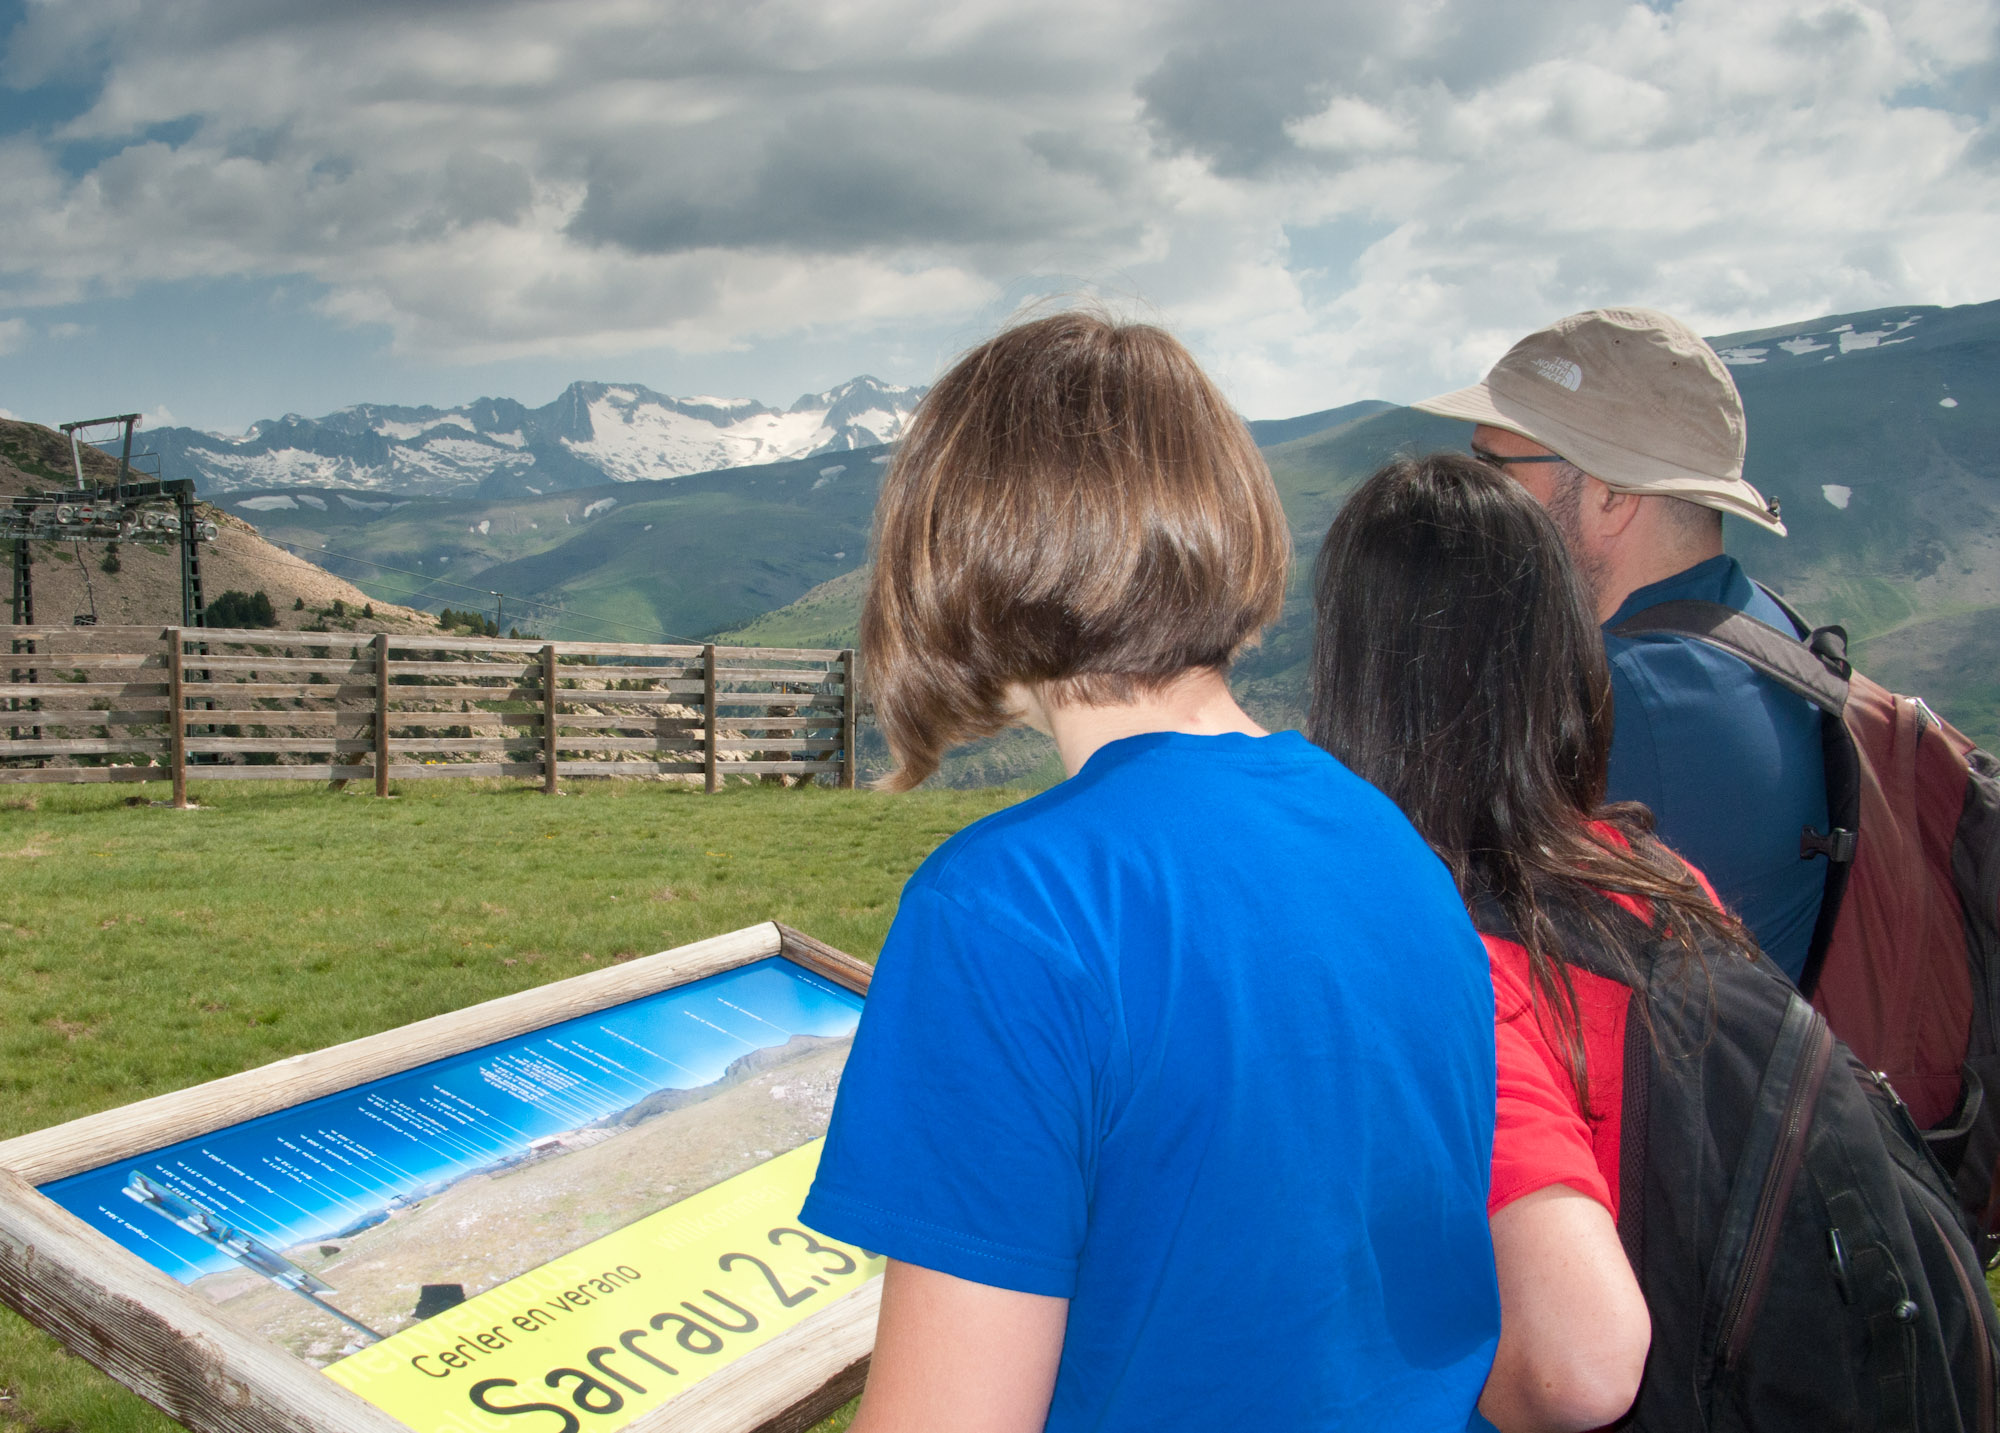 familia contemplando el pico Aneto